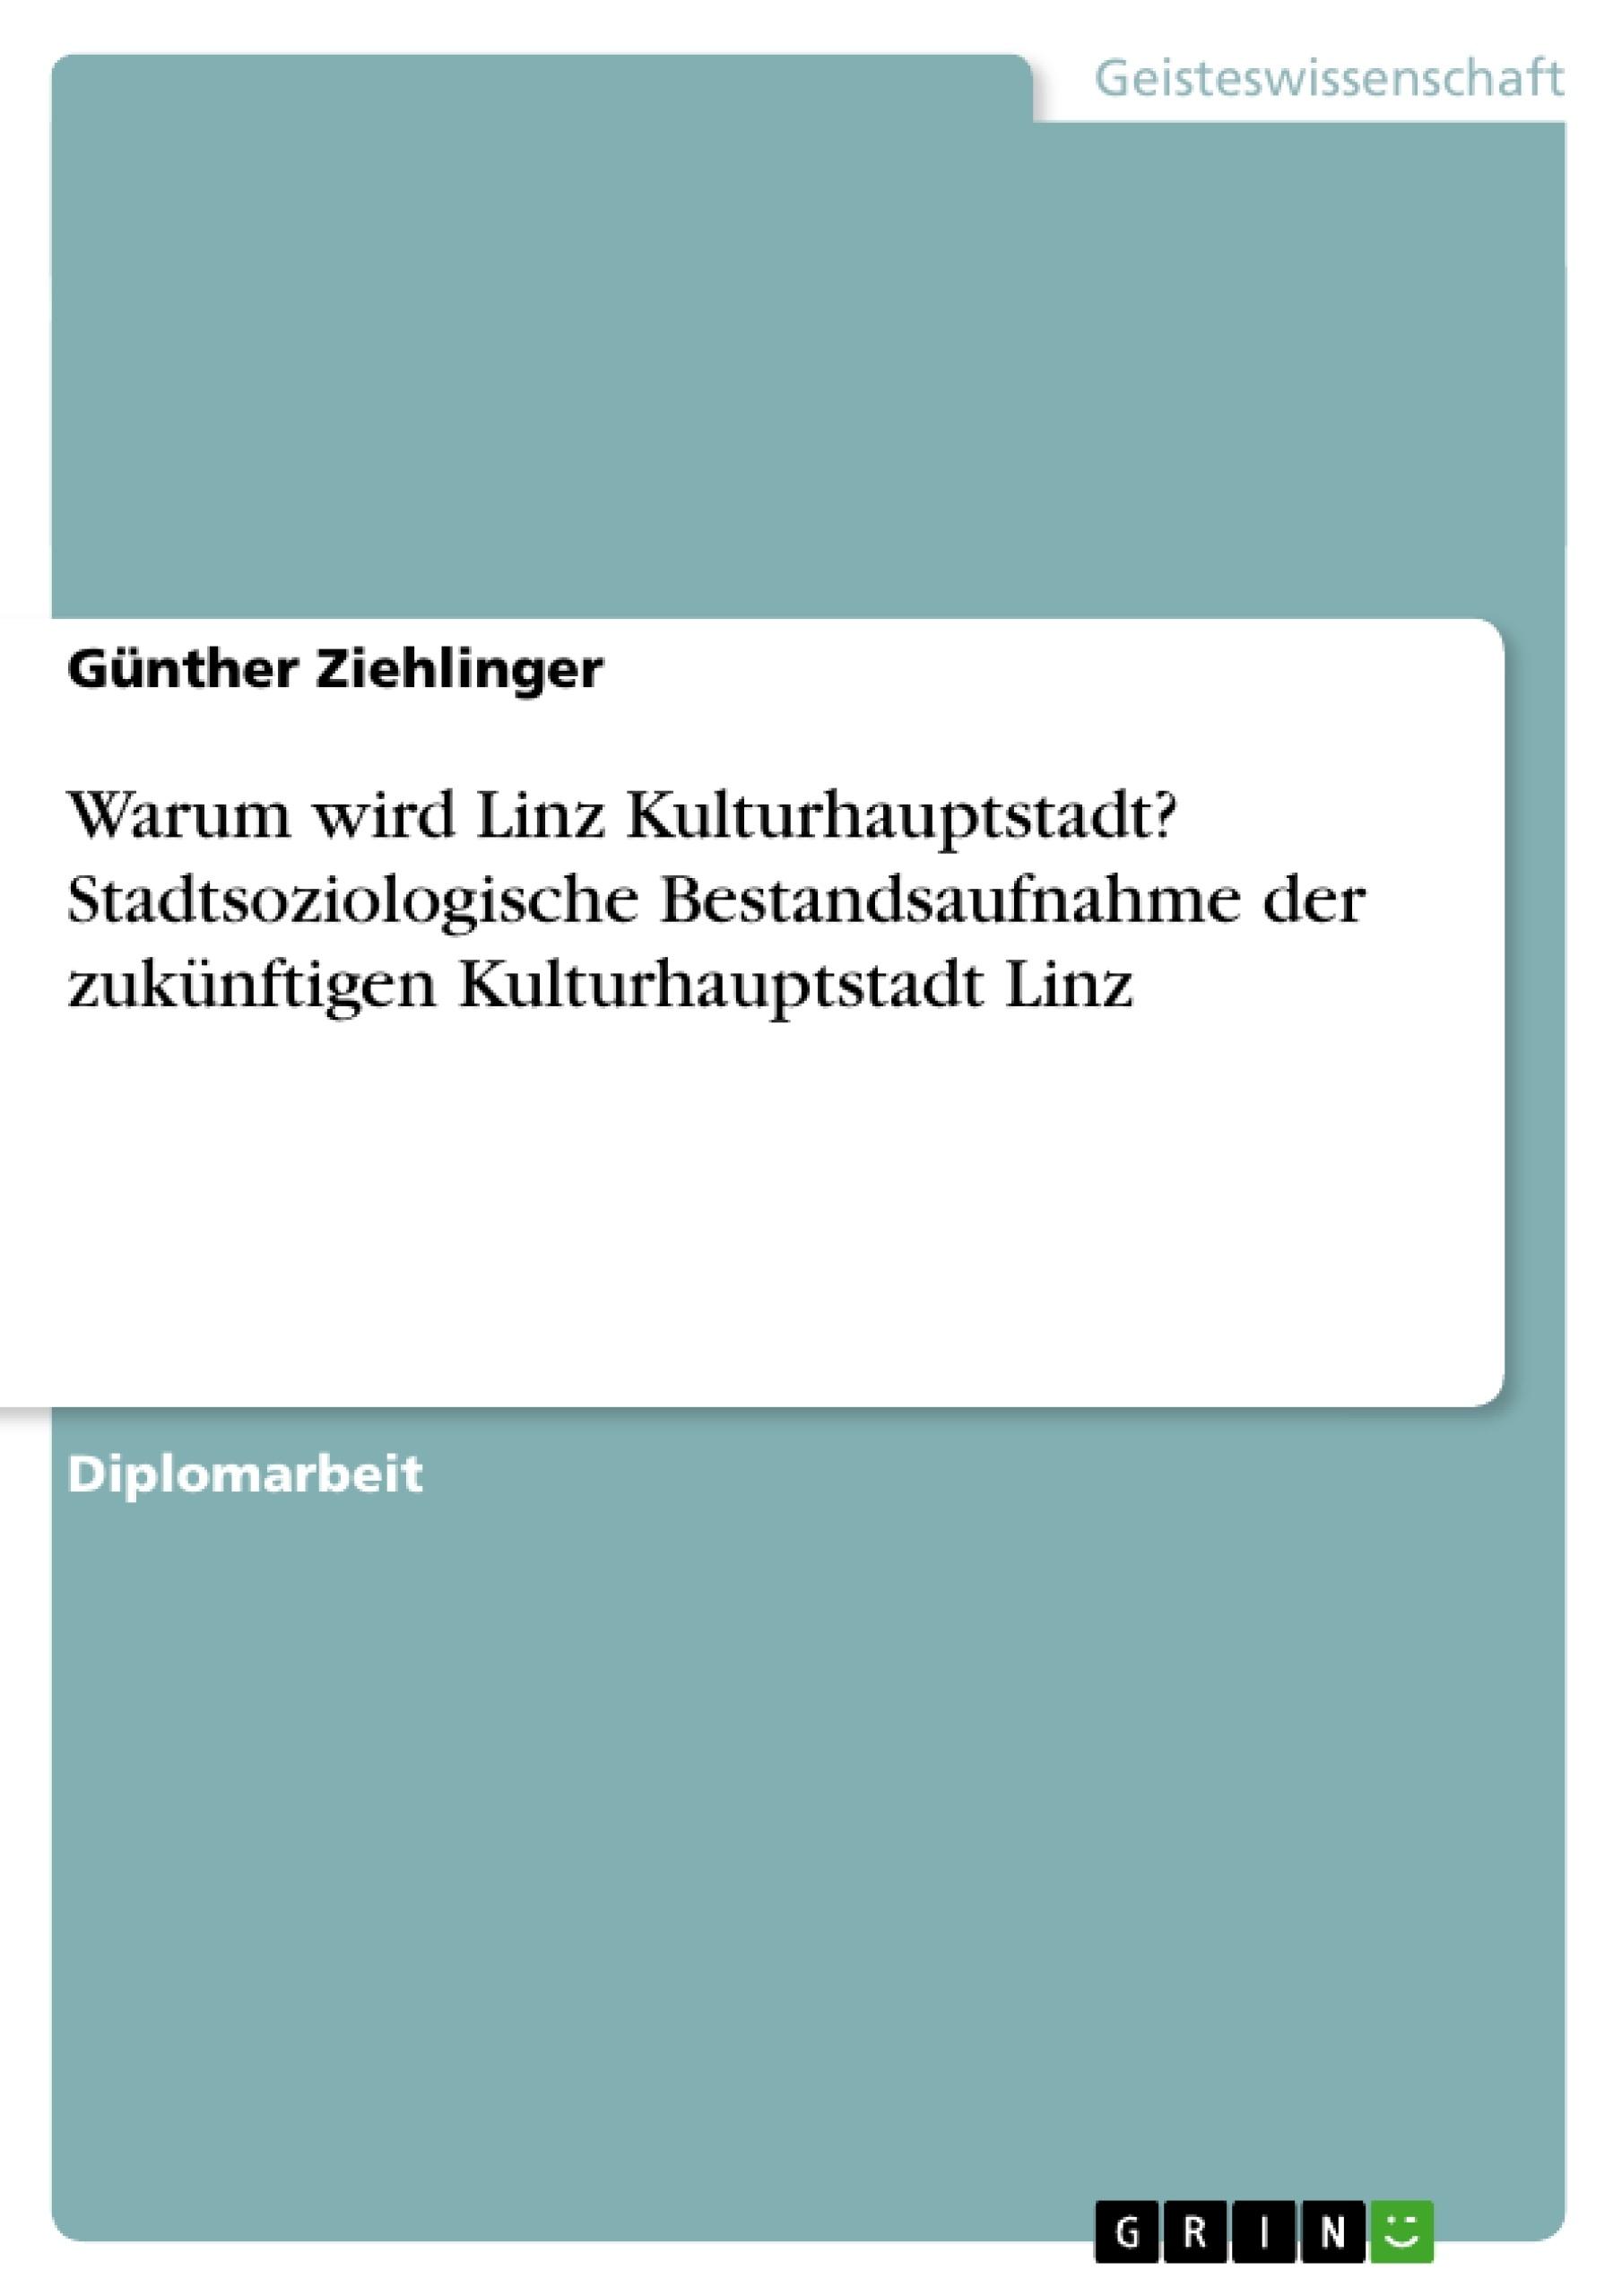 Titel: Warum wird Linz Kulturhauptstadt? Stadtsoziologische Bestandsaufnahme der zukünftigen Kulturhauptstadt Linz